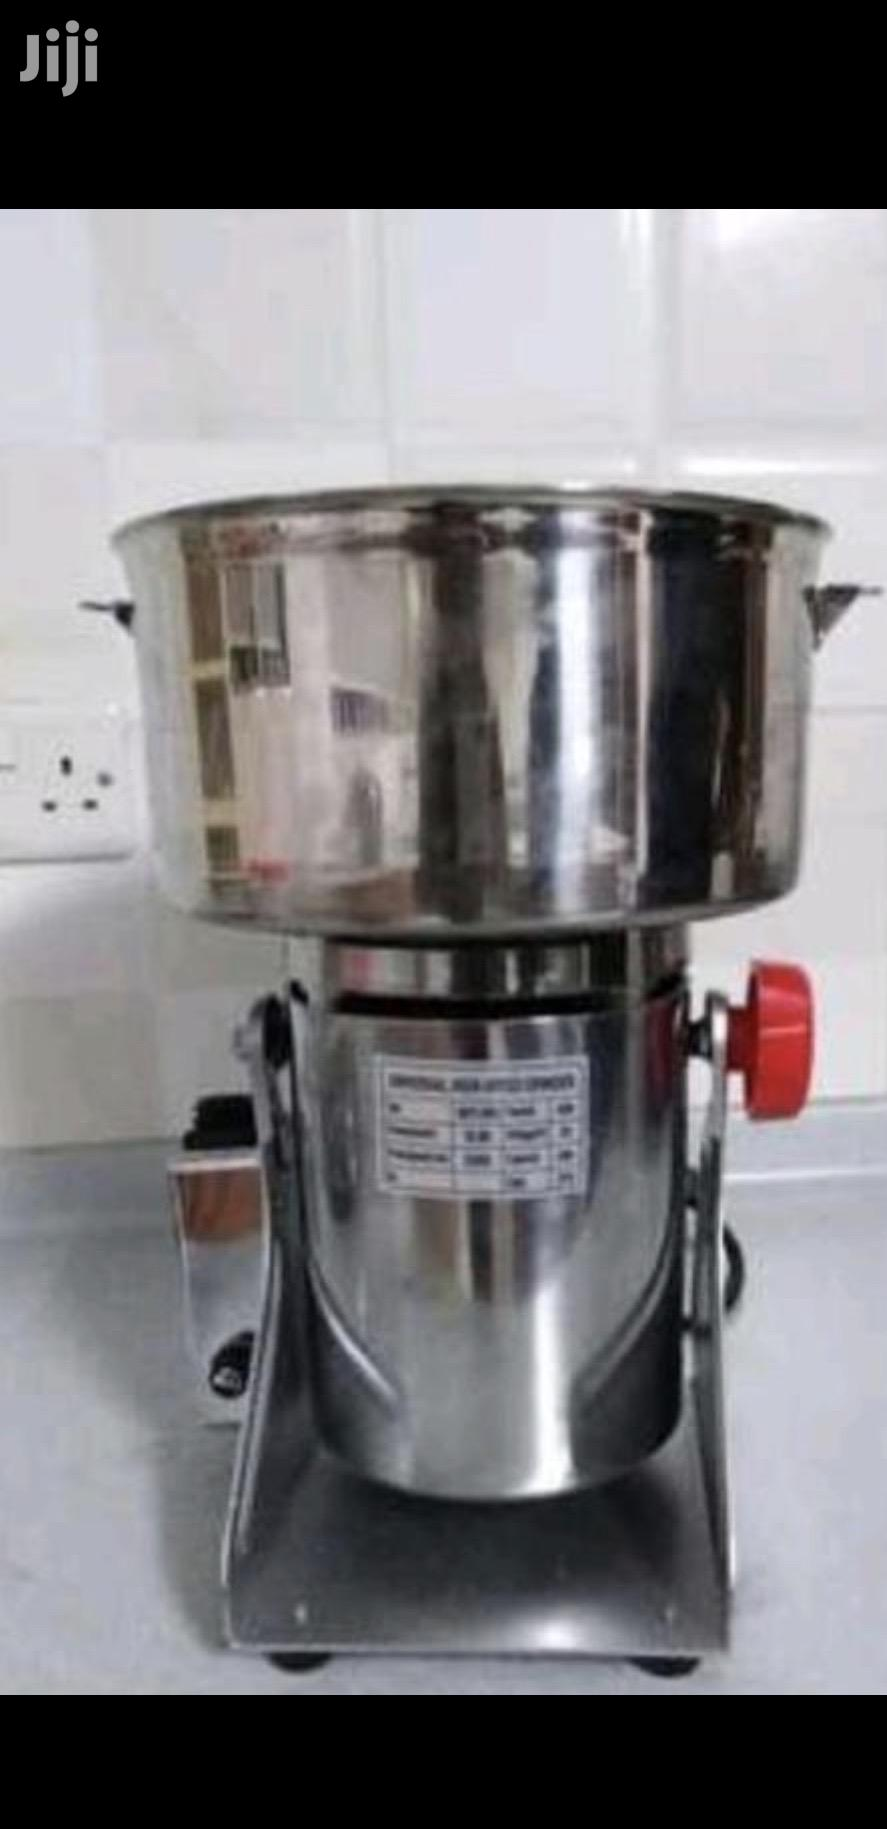 Flour Maize Meal Or Spice Grinder